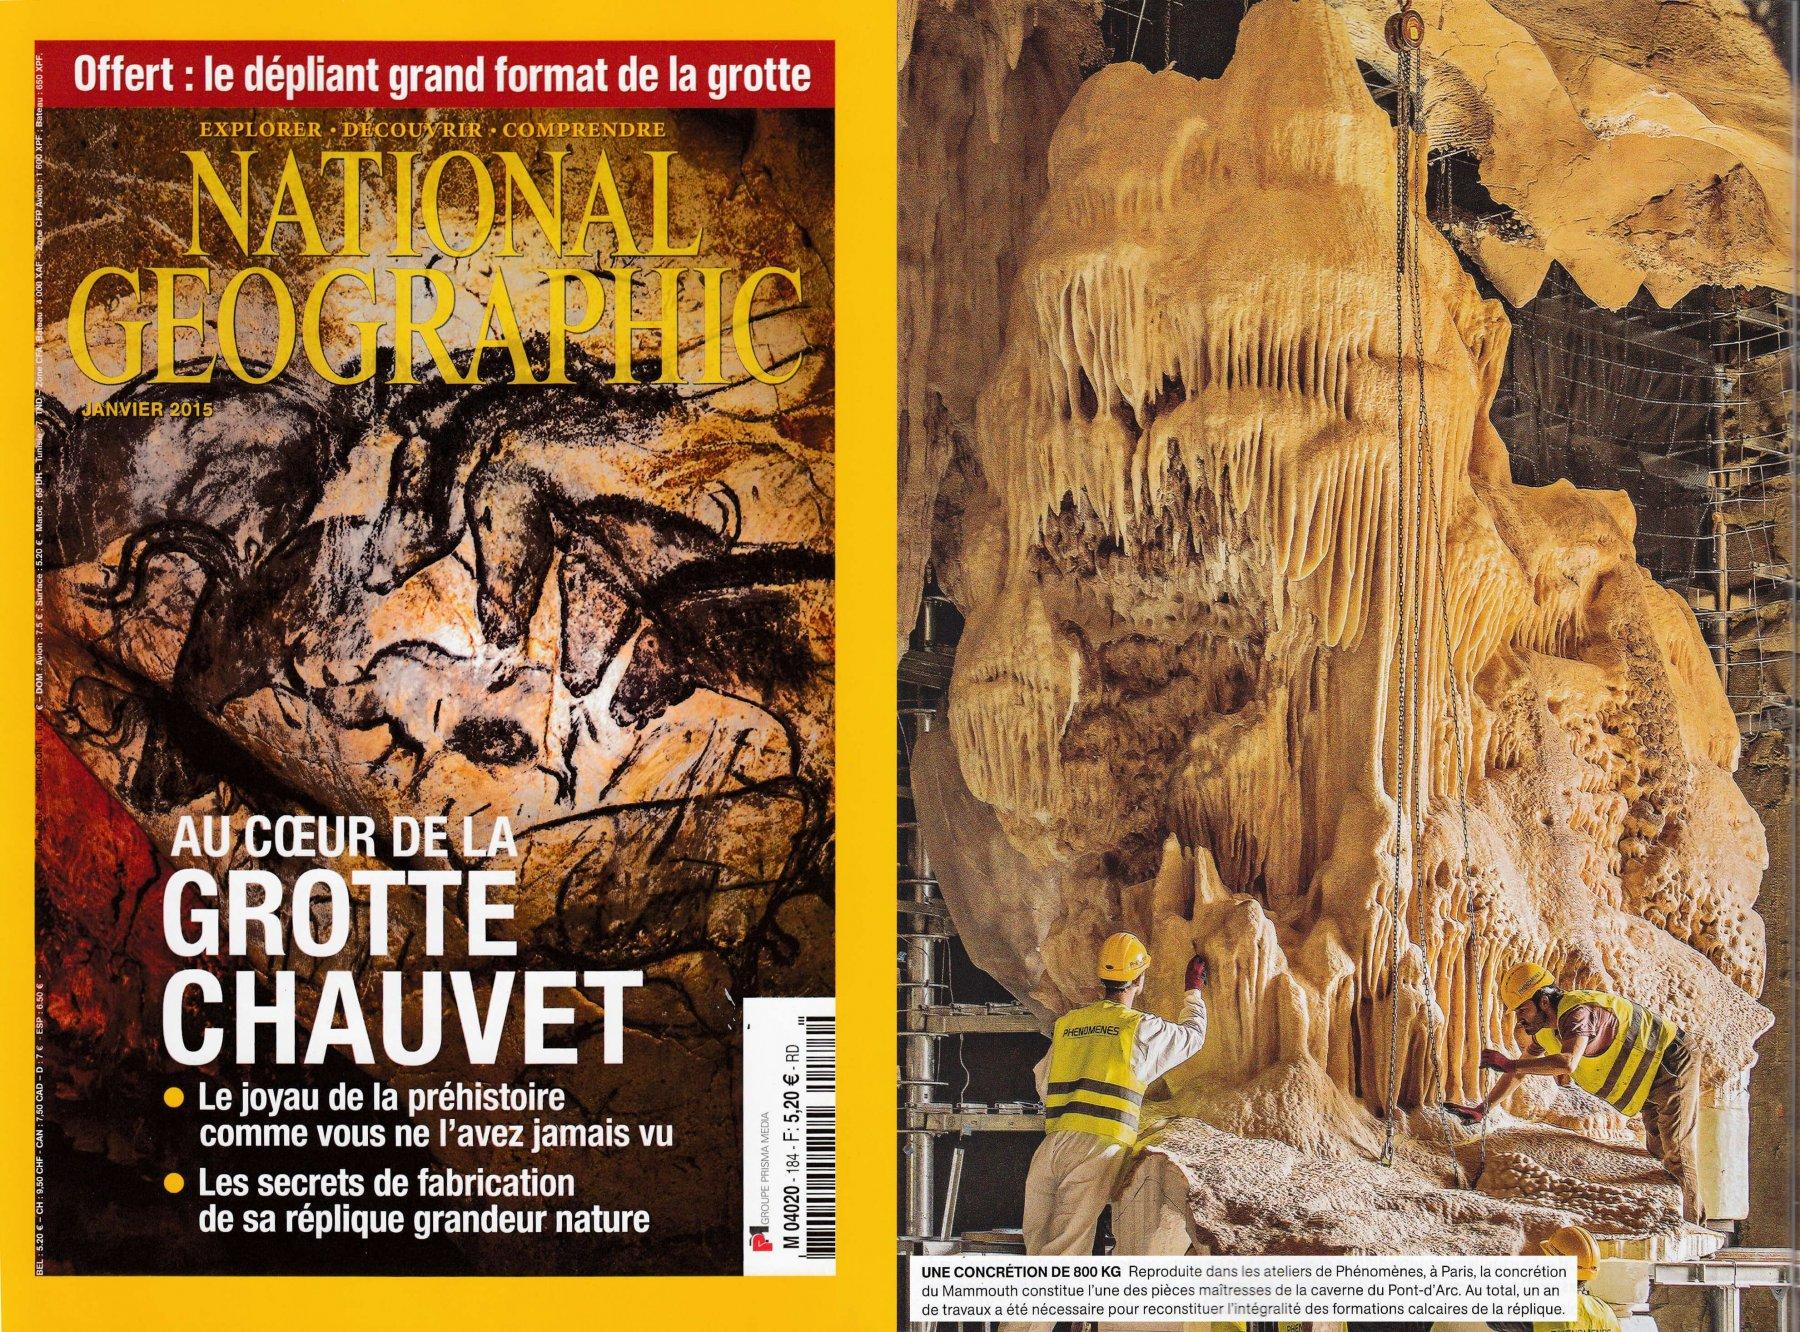 PHENOMENES sur National Geographic